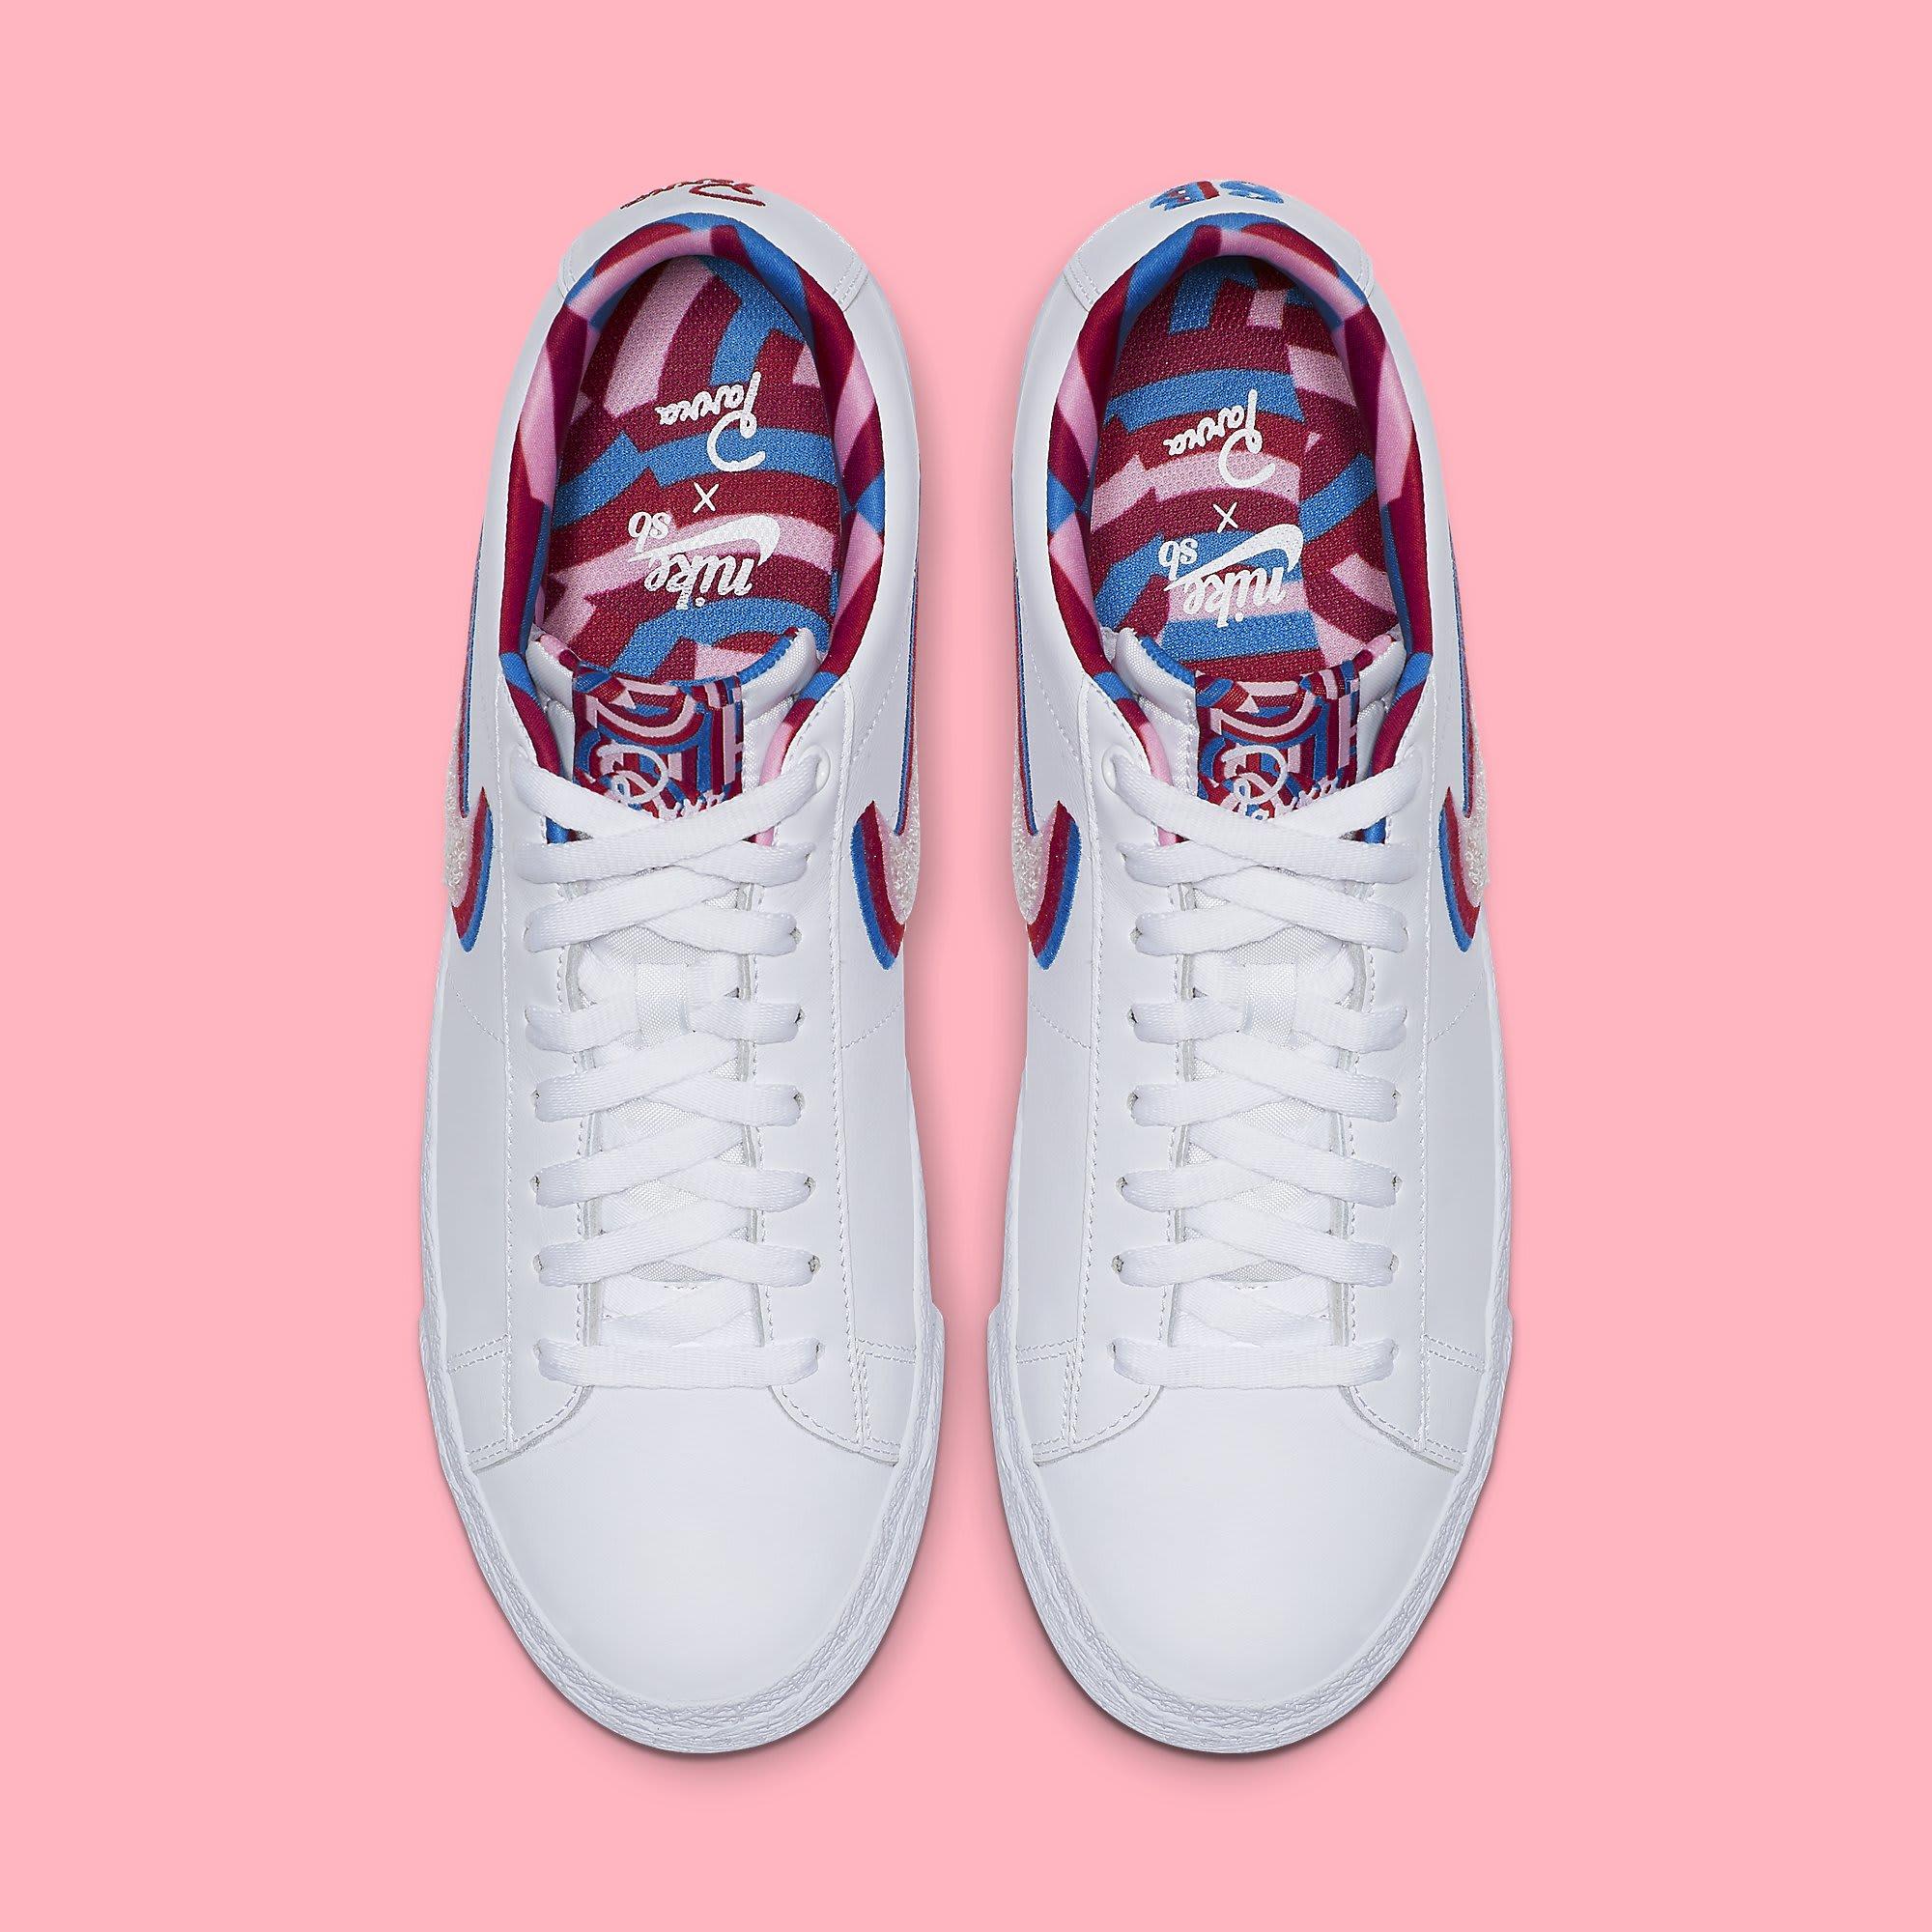 Parra x Nike SB Blazer Low CN4507-100 Top